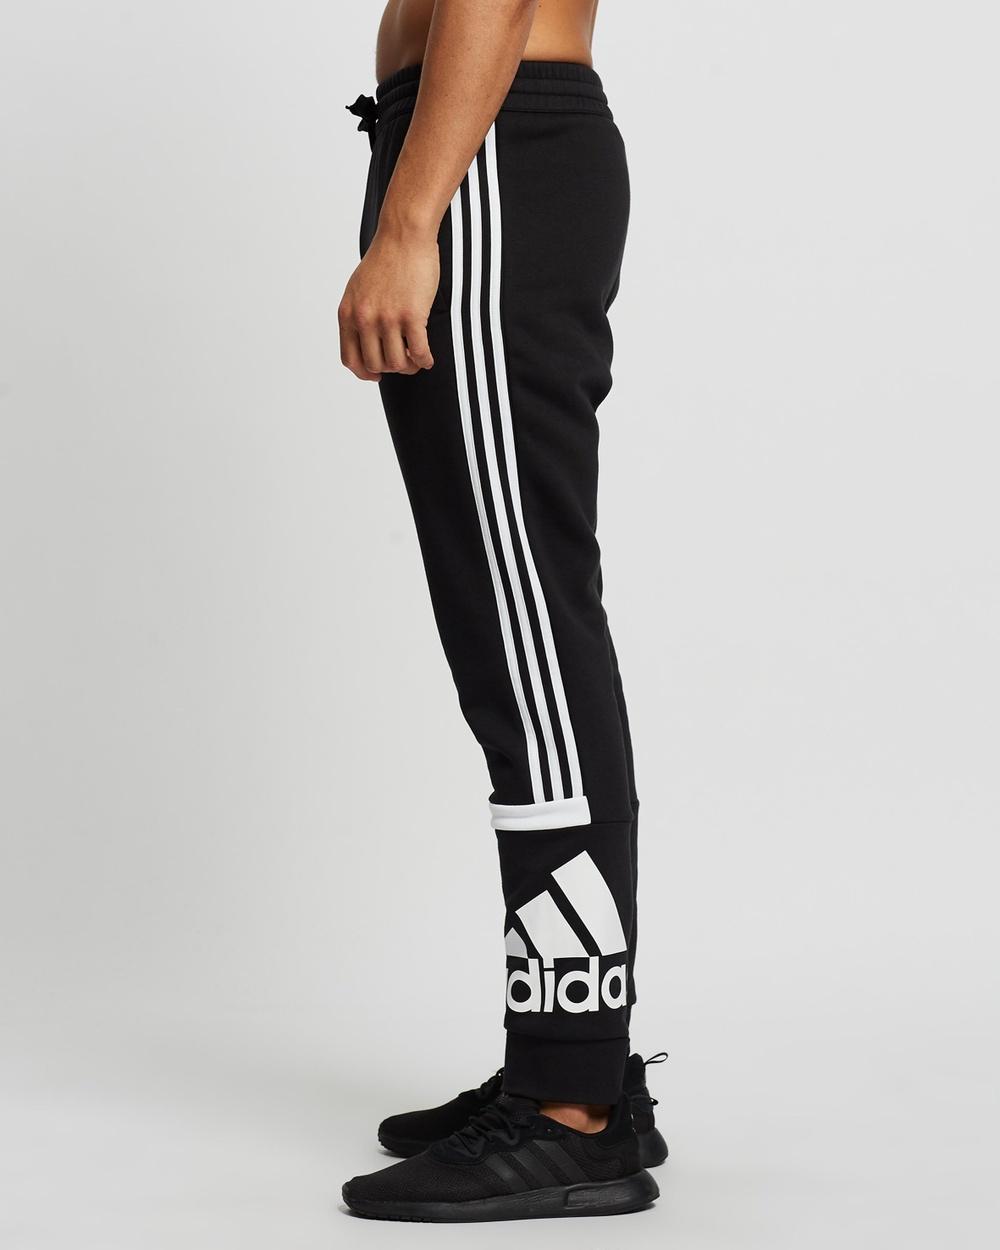 adidas Performance Essentials Logo Colourblock Cuff Pants Sweatpants Black